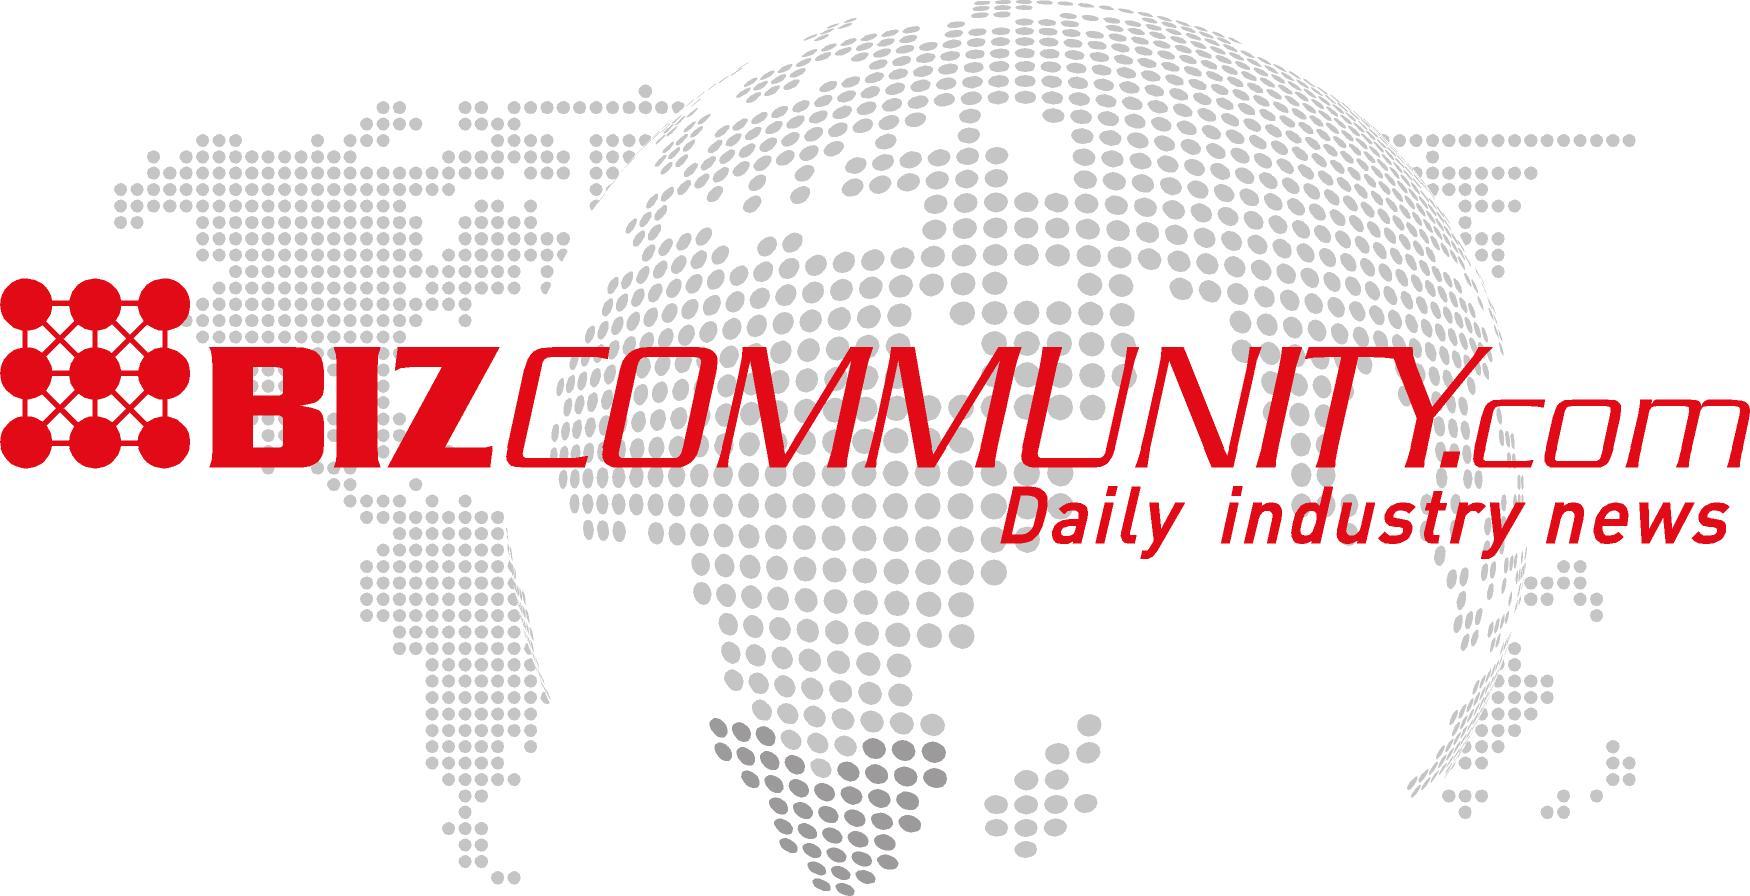 Publish guest post on BizCommunity.com ( DA-60 / PA - 49 / TF - 53 / PR - 6 )